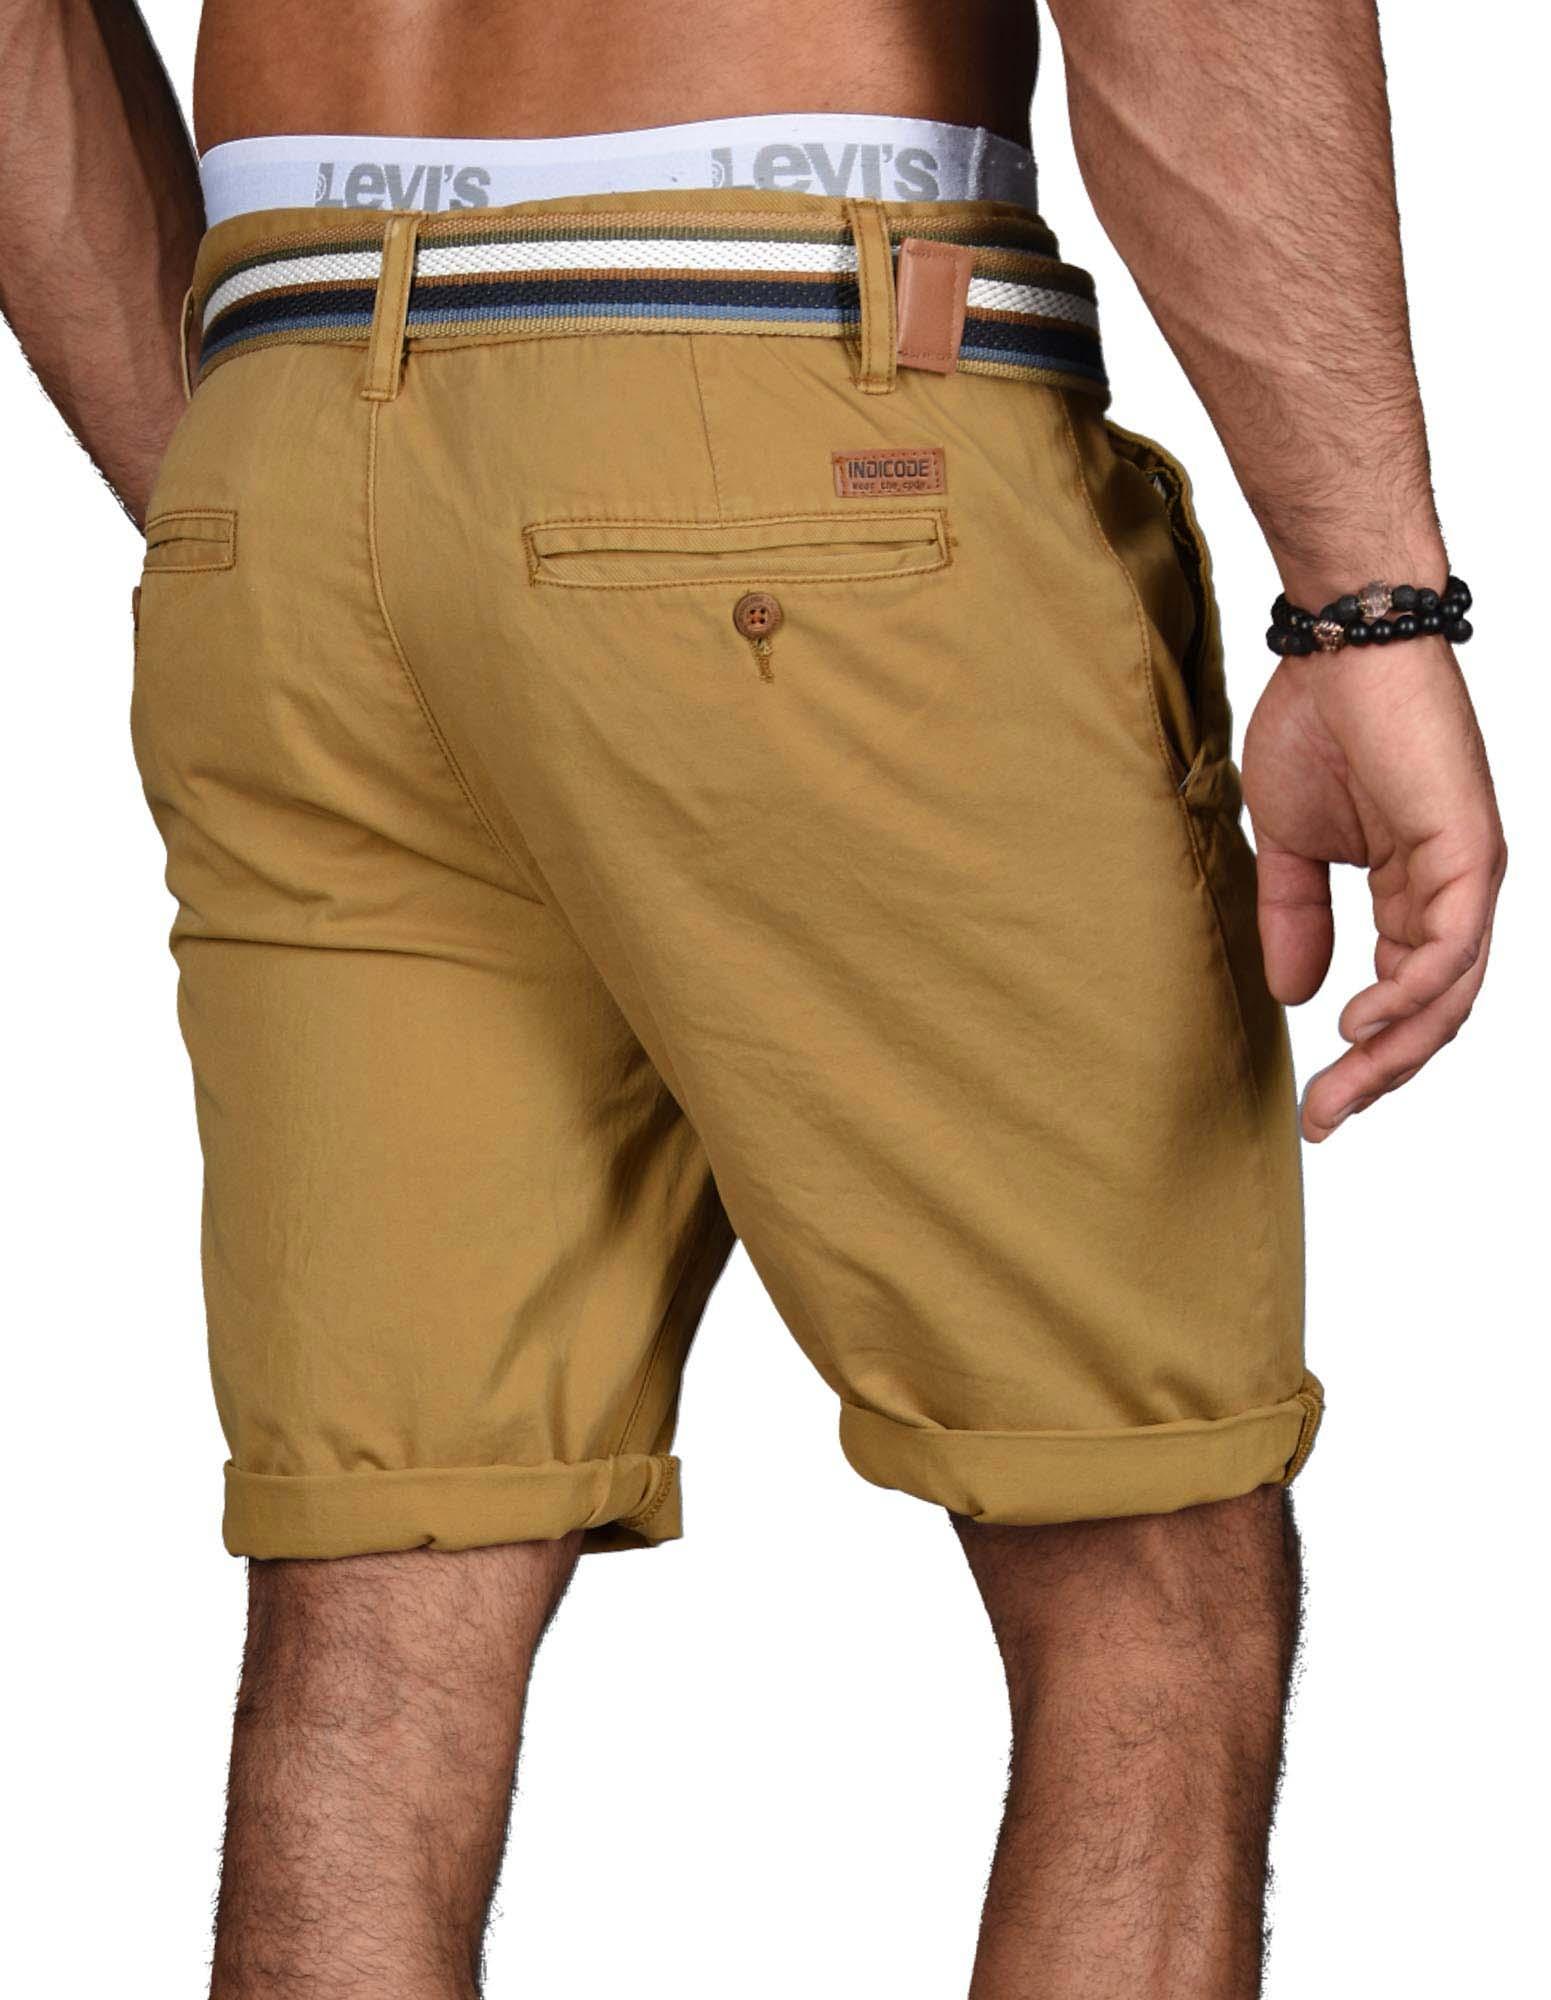 Indicode-Herren-Sommer-Bermuda-Chino-Shorts-kurze-Hose-Sommerhose-Short-NEU-B499 Indexbild 8